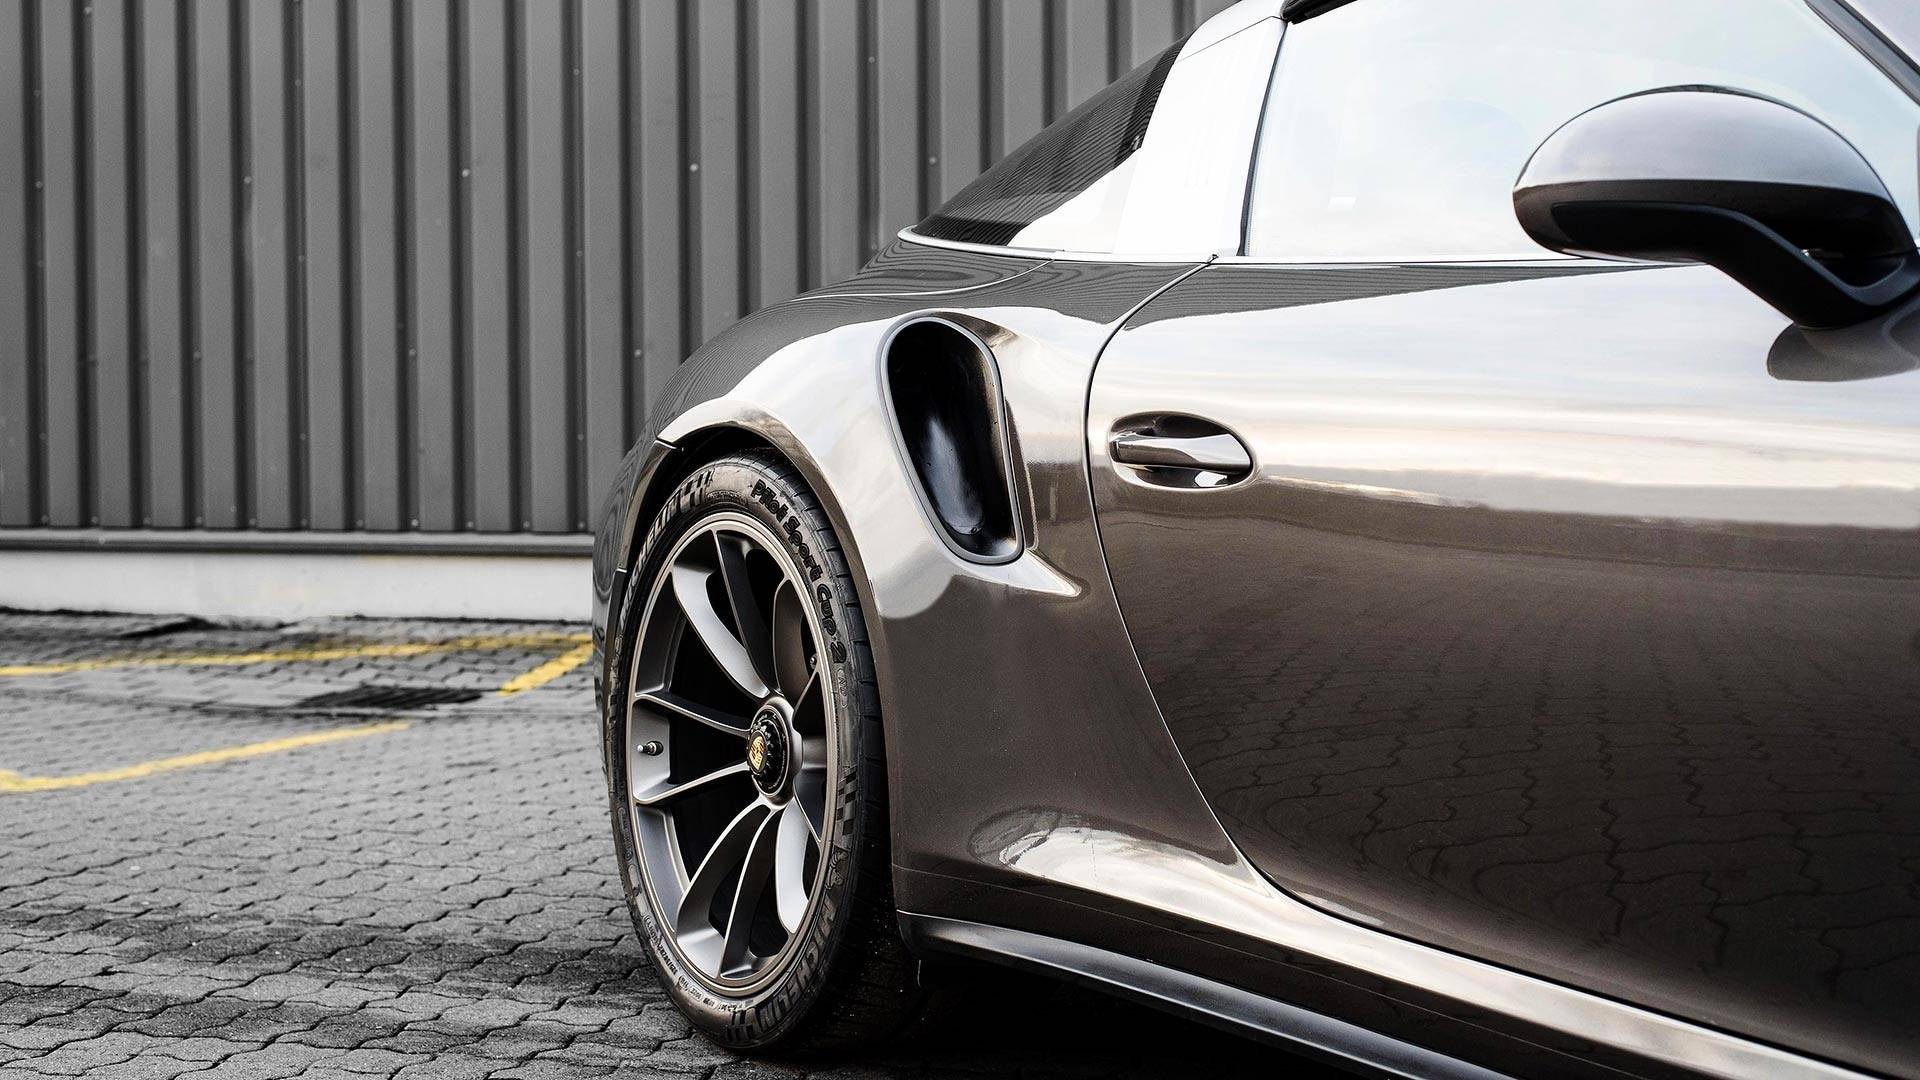 Porsche_911_Targa_GT3_by_Mcchip-dkr_0007